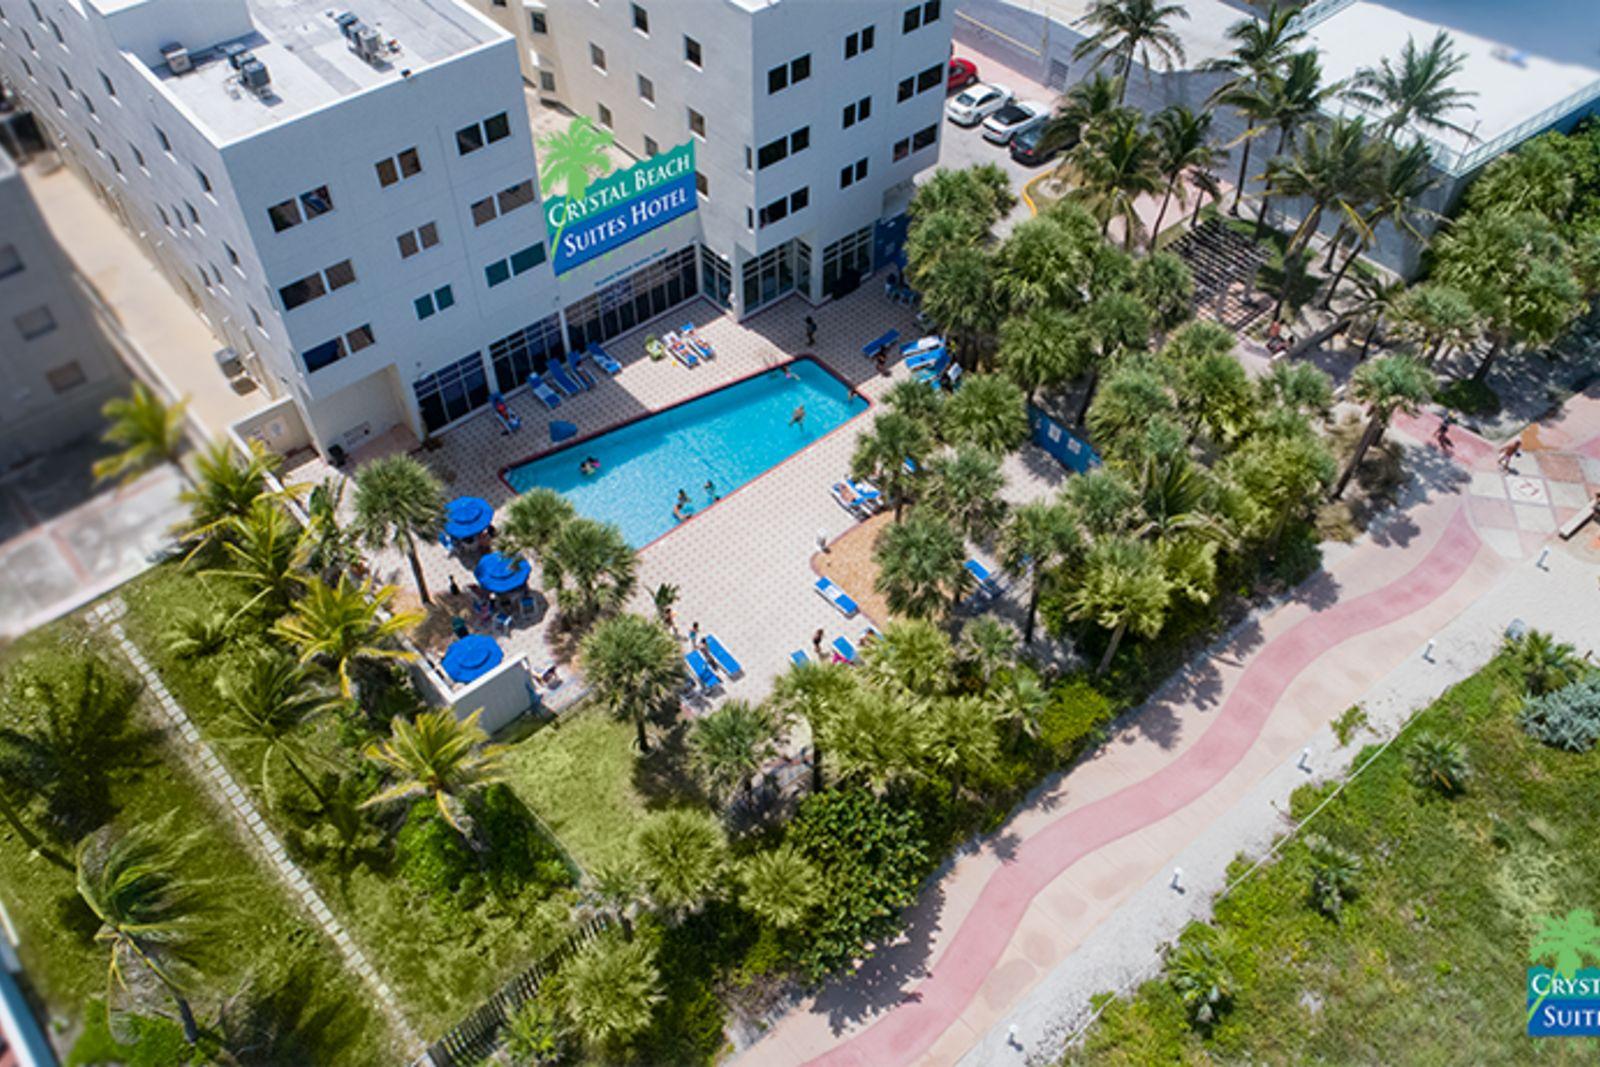 Crystal Beach Suites Hotel Photo Gallery